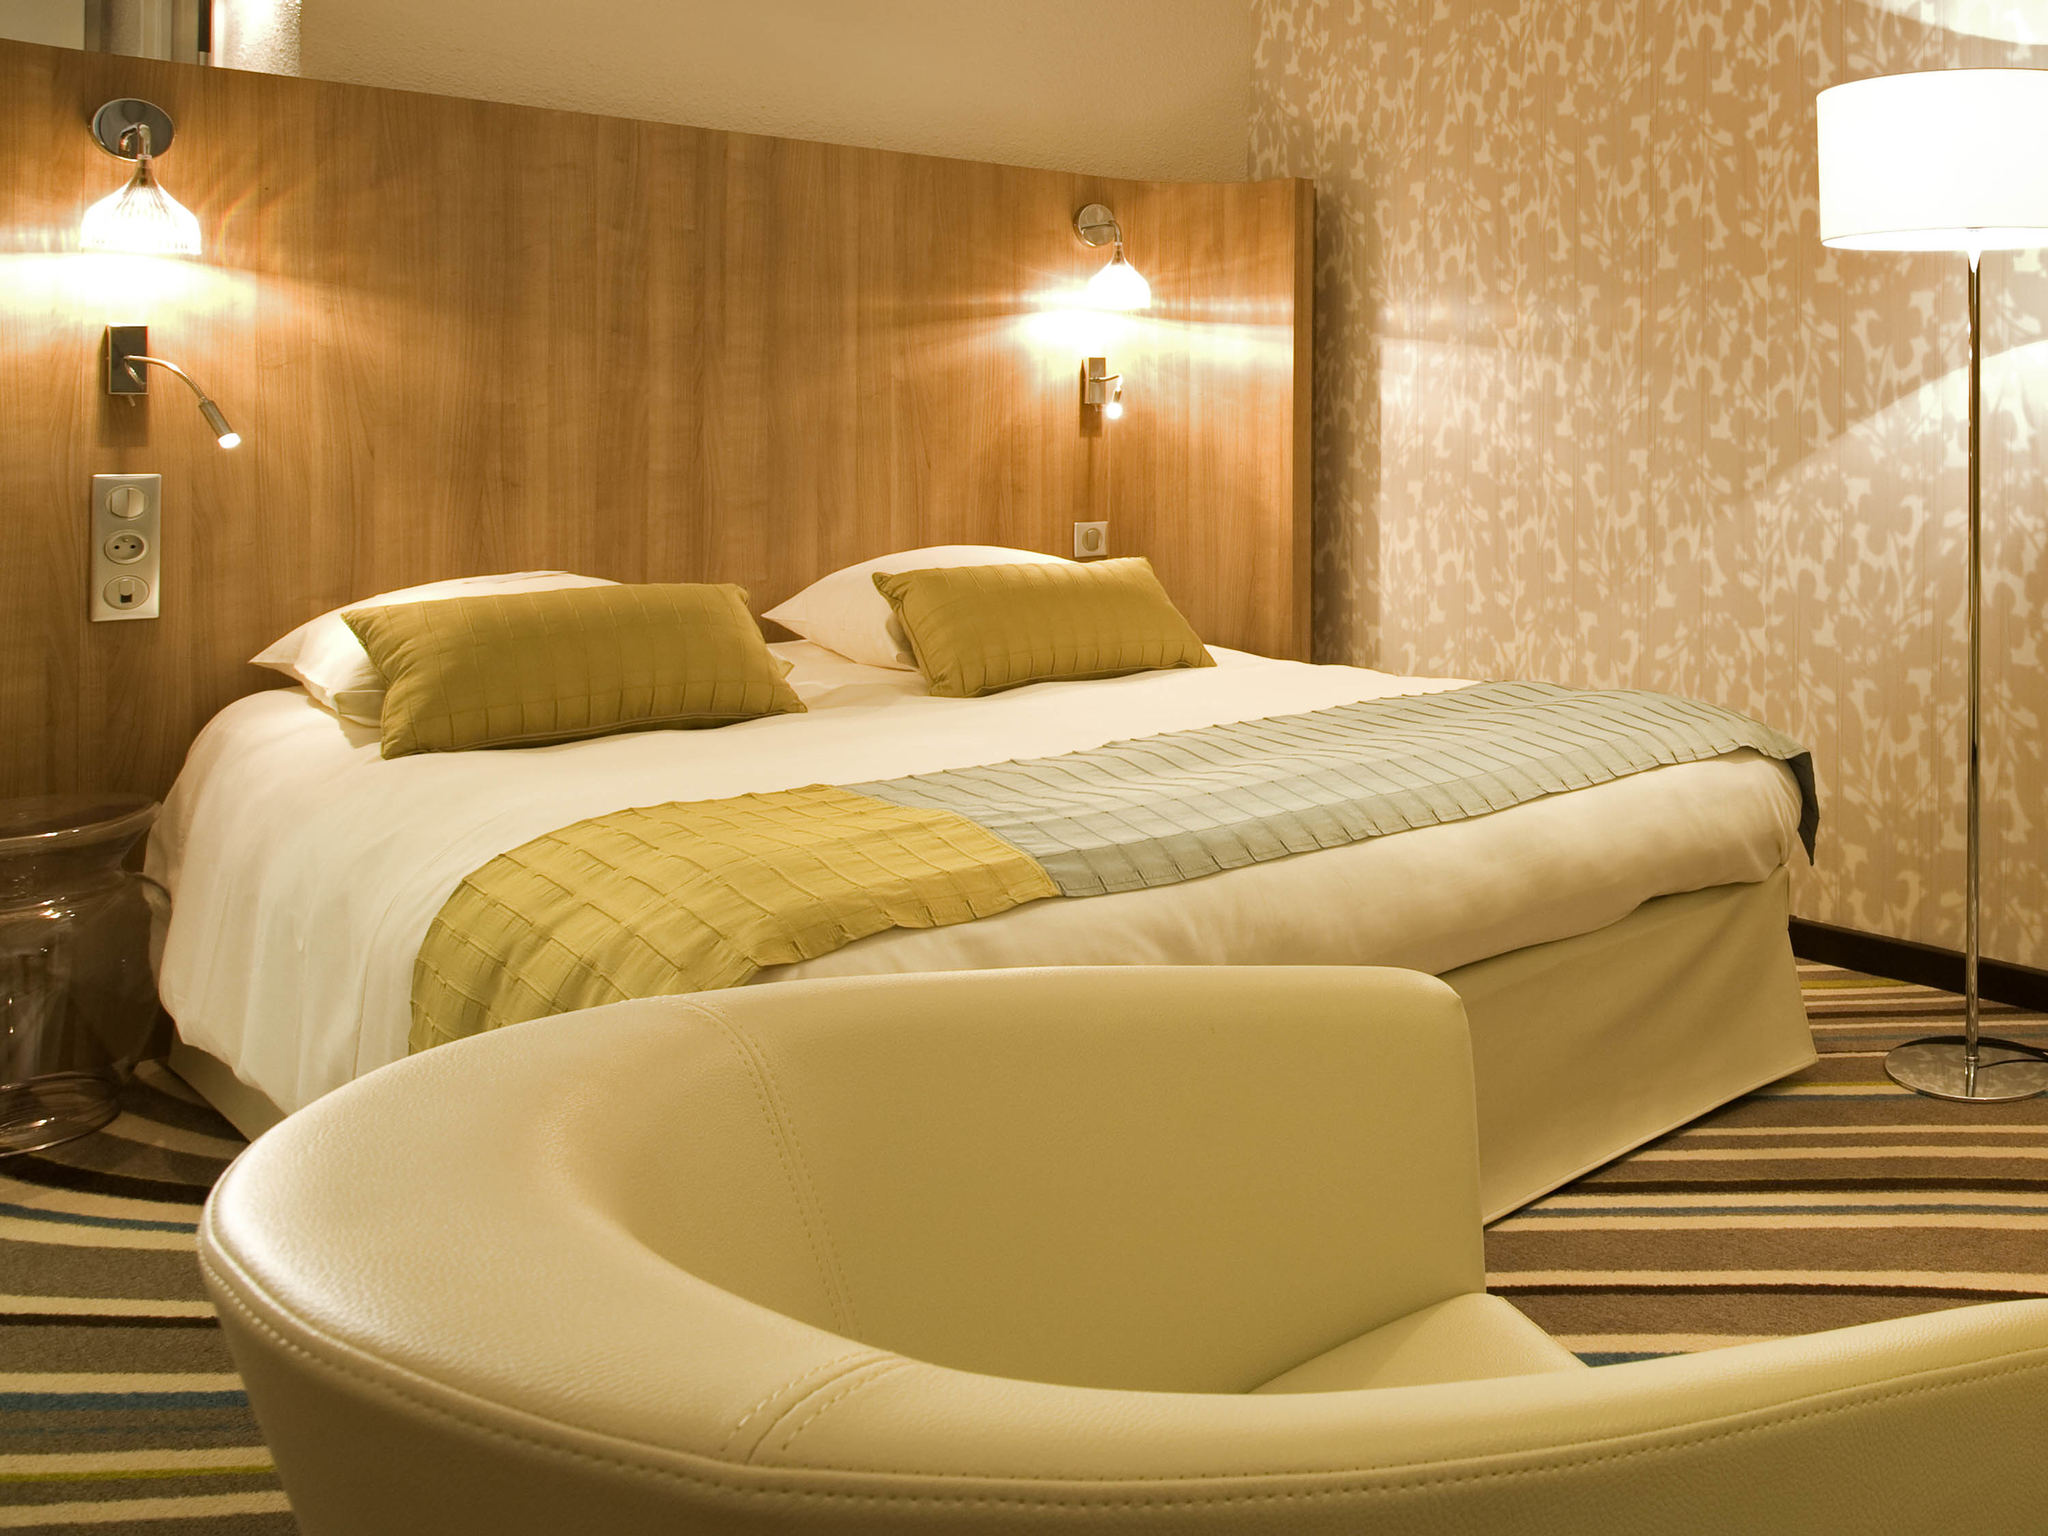 Hotel – Hotel Mercure Angers Centro